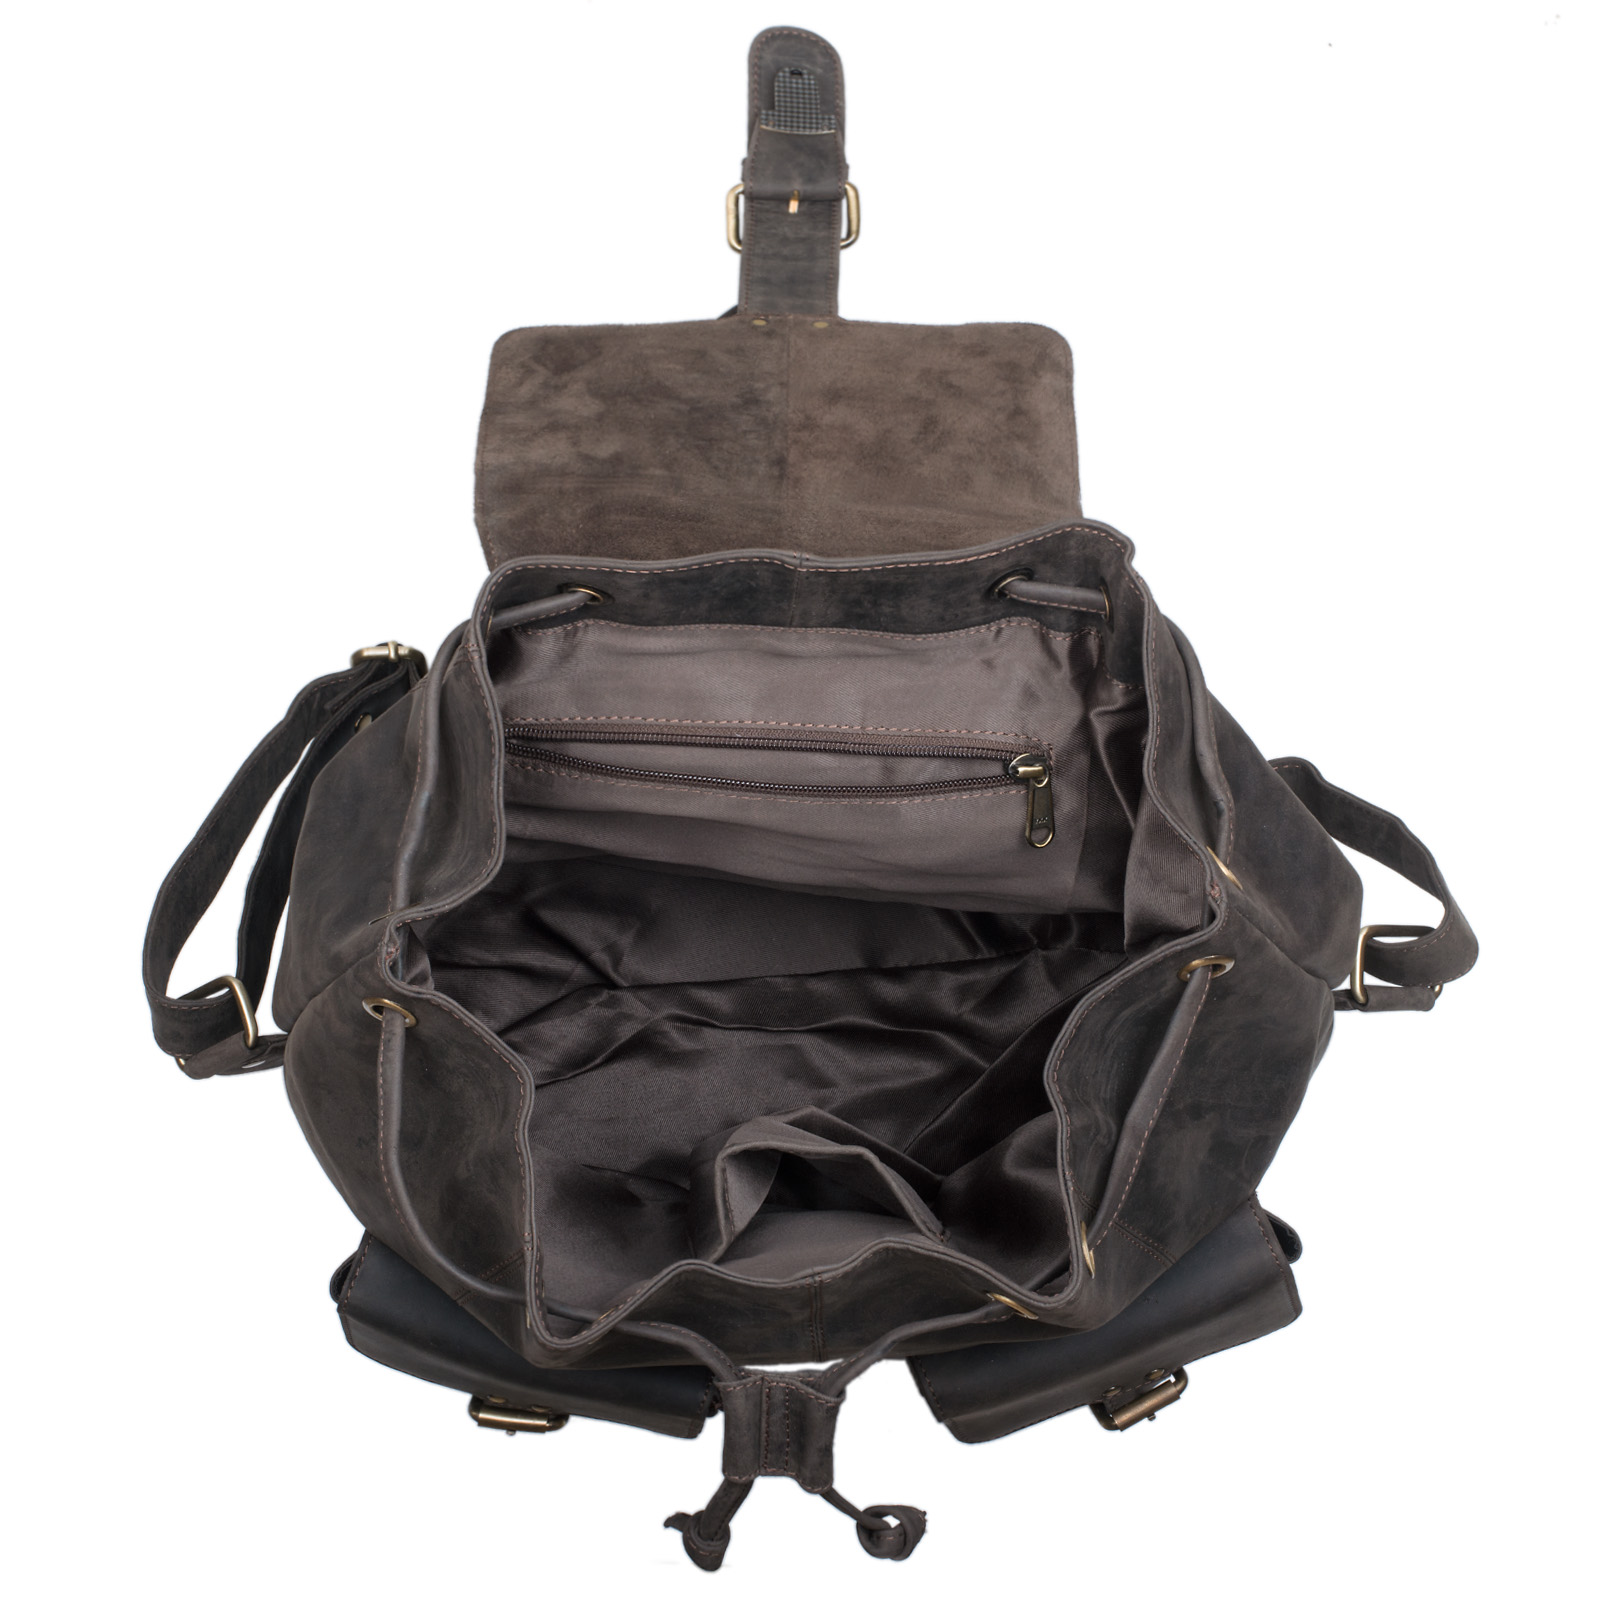 "STILORD ""Larissa"" Vintage Rucksack Leder Damen Rucksackhandtasche Lederrucksack Handtasche DIN A4 City Shopping Daypack Schule Uni - Bild 15"